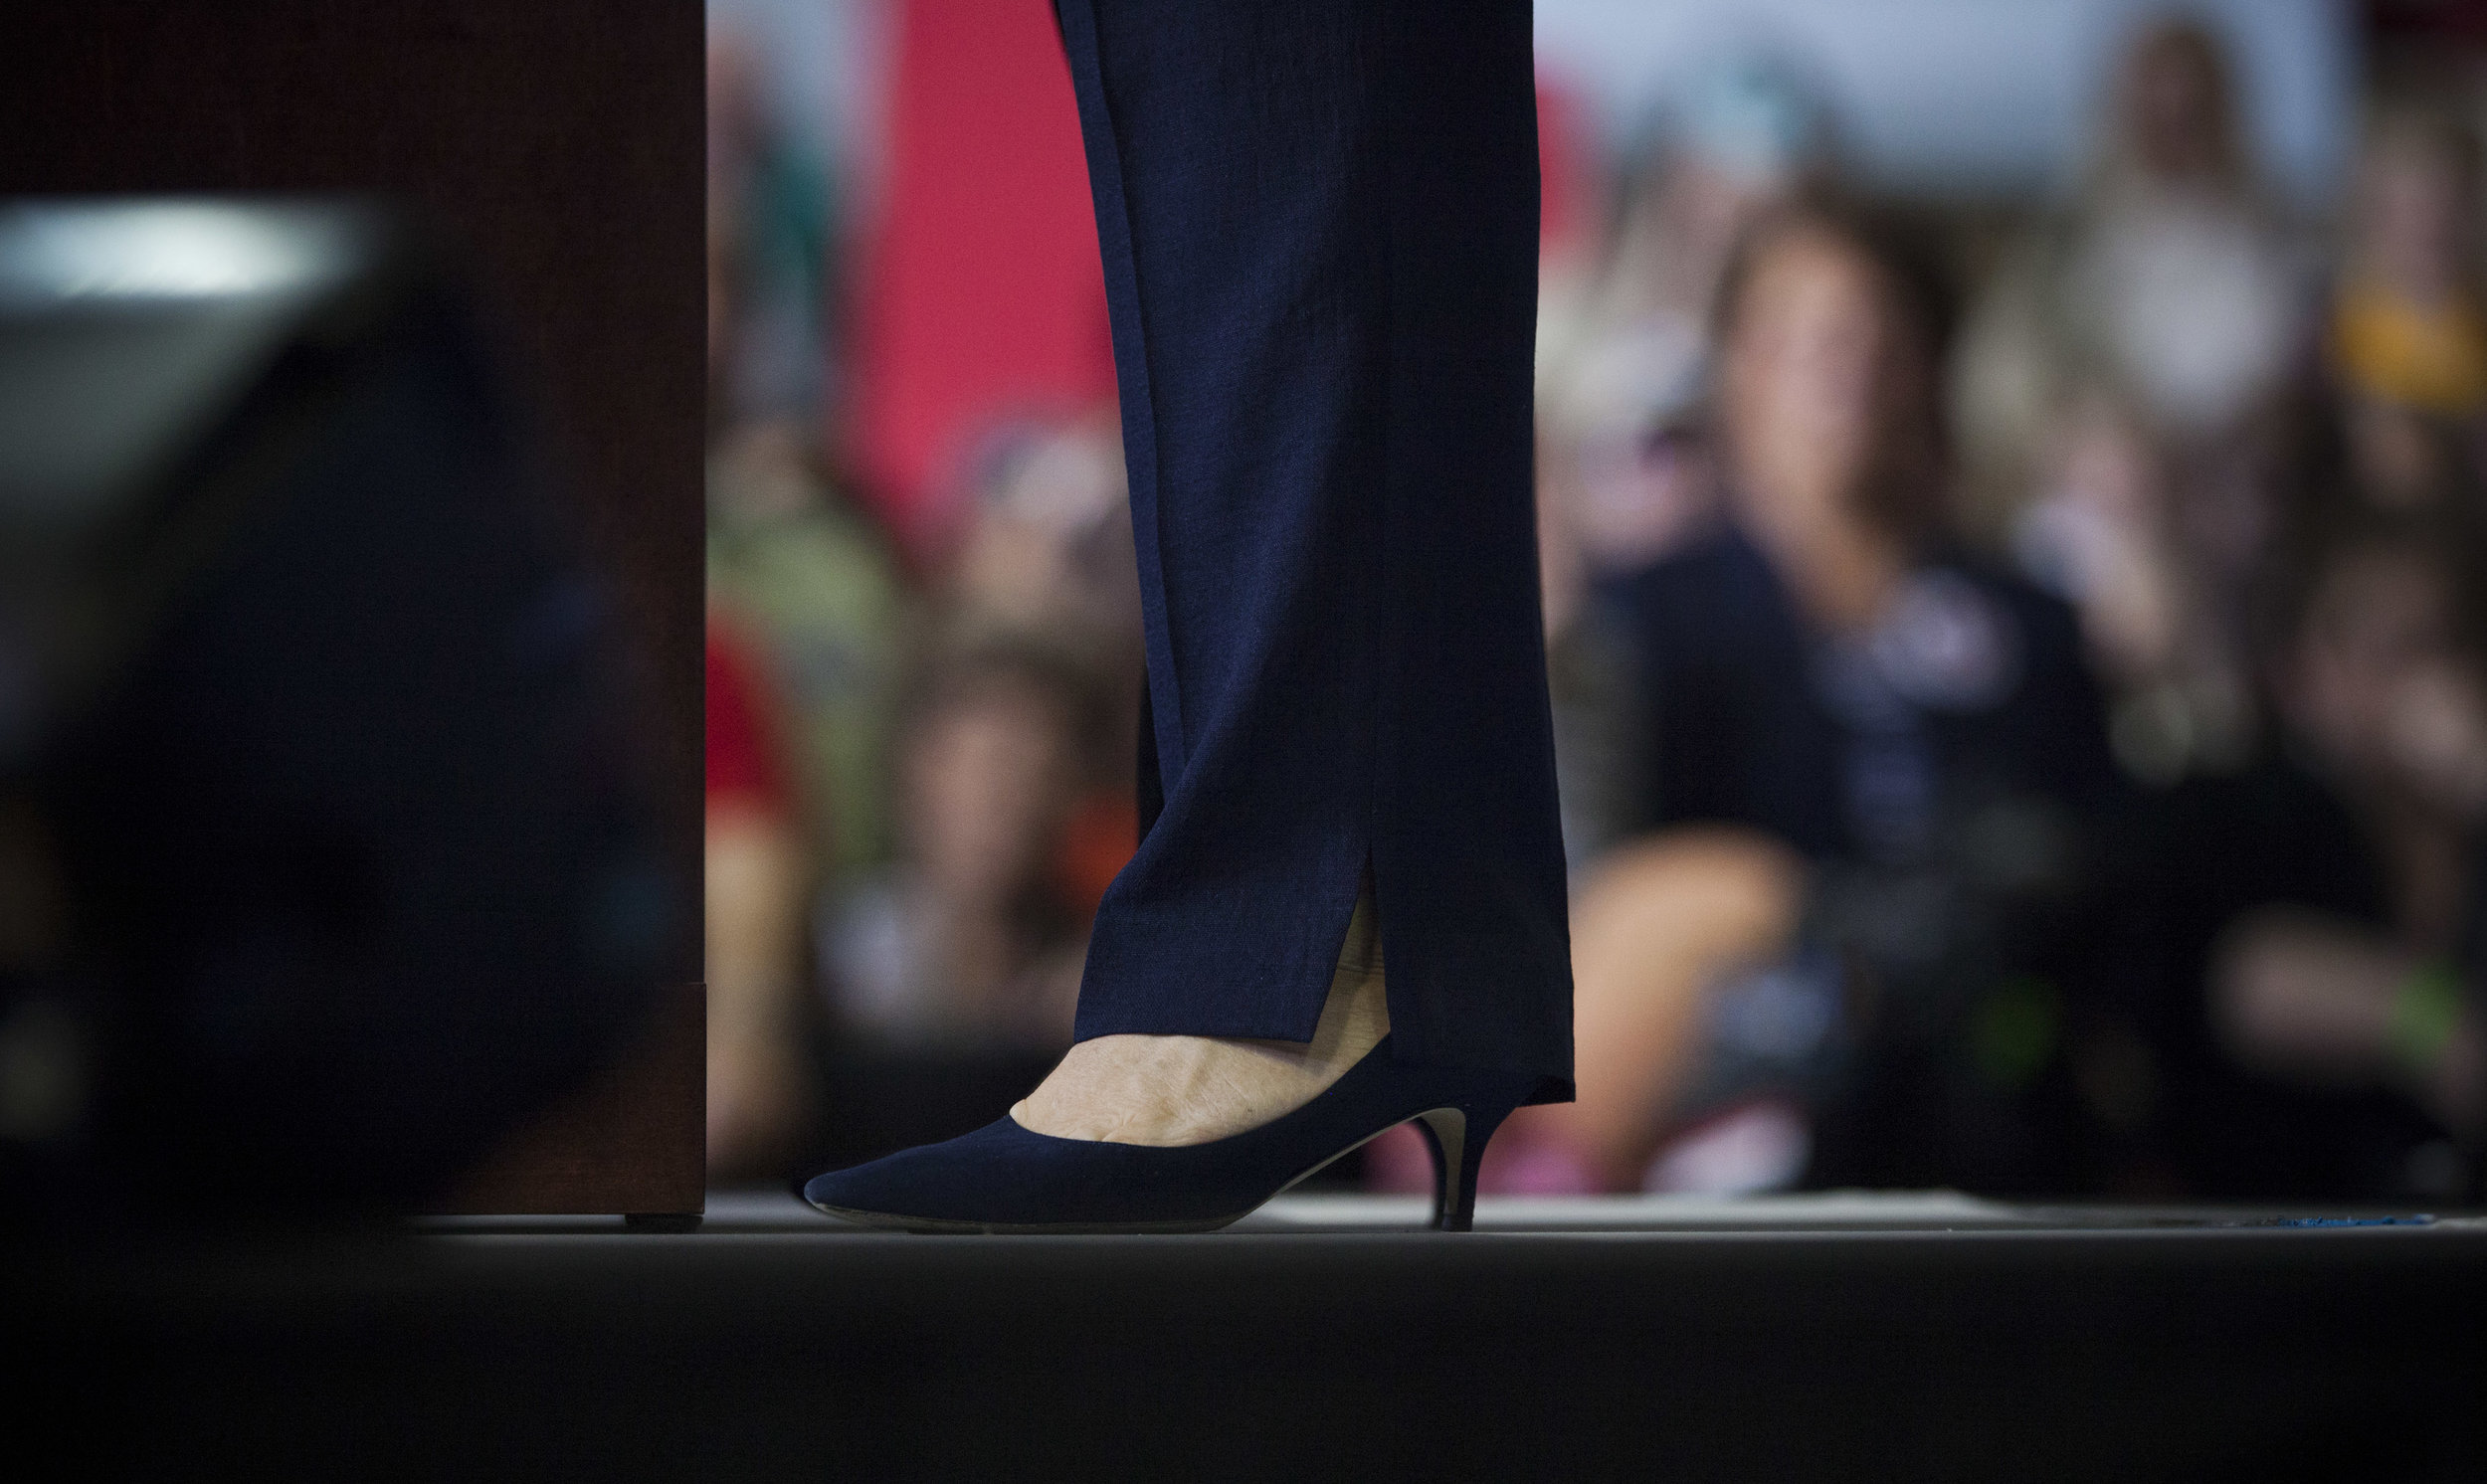 10042016_BJM_Hillary_Clinton_Campaigns_in_Harrisburg_Pennsylvania_15.jpg